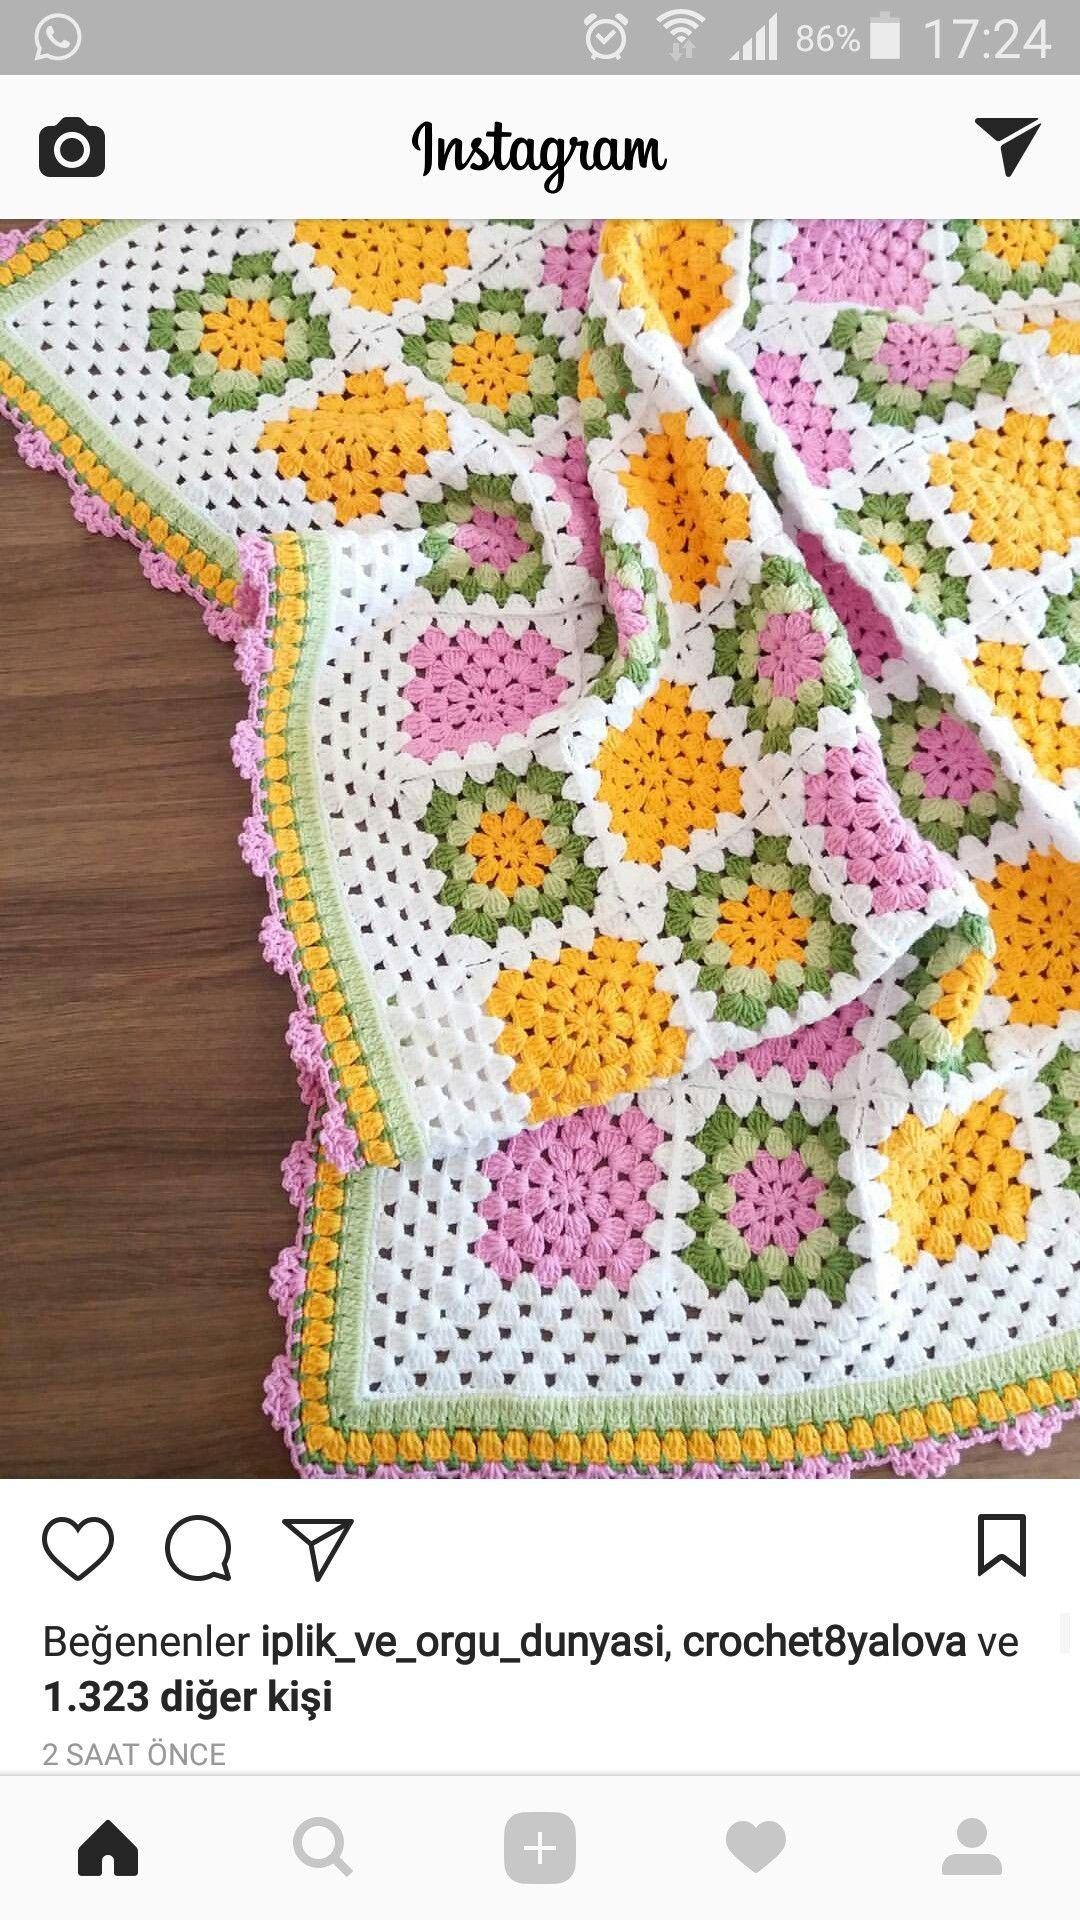 Pin de nena garcia castillo en crochet | Pinterest | Manta, Colchas ...